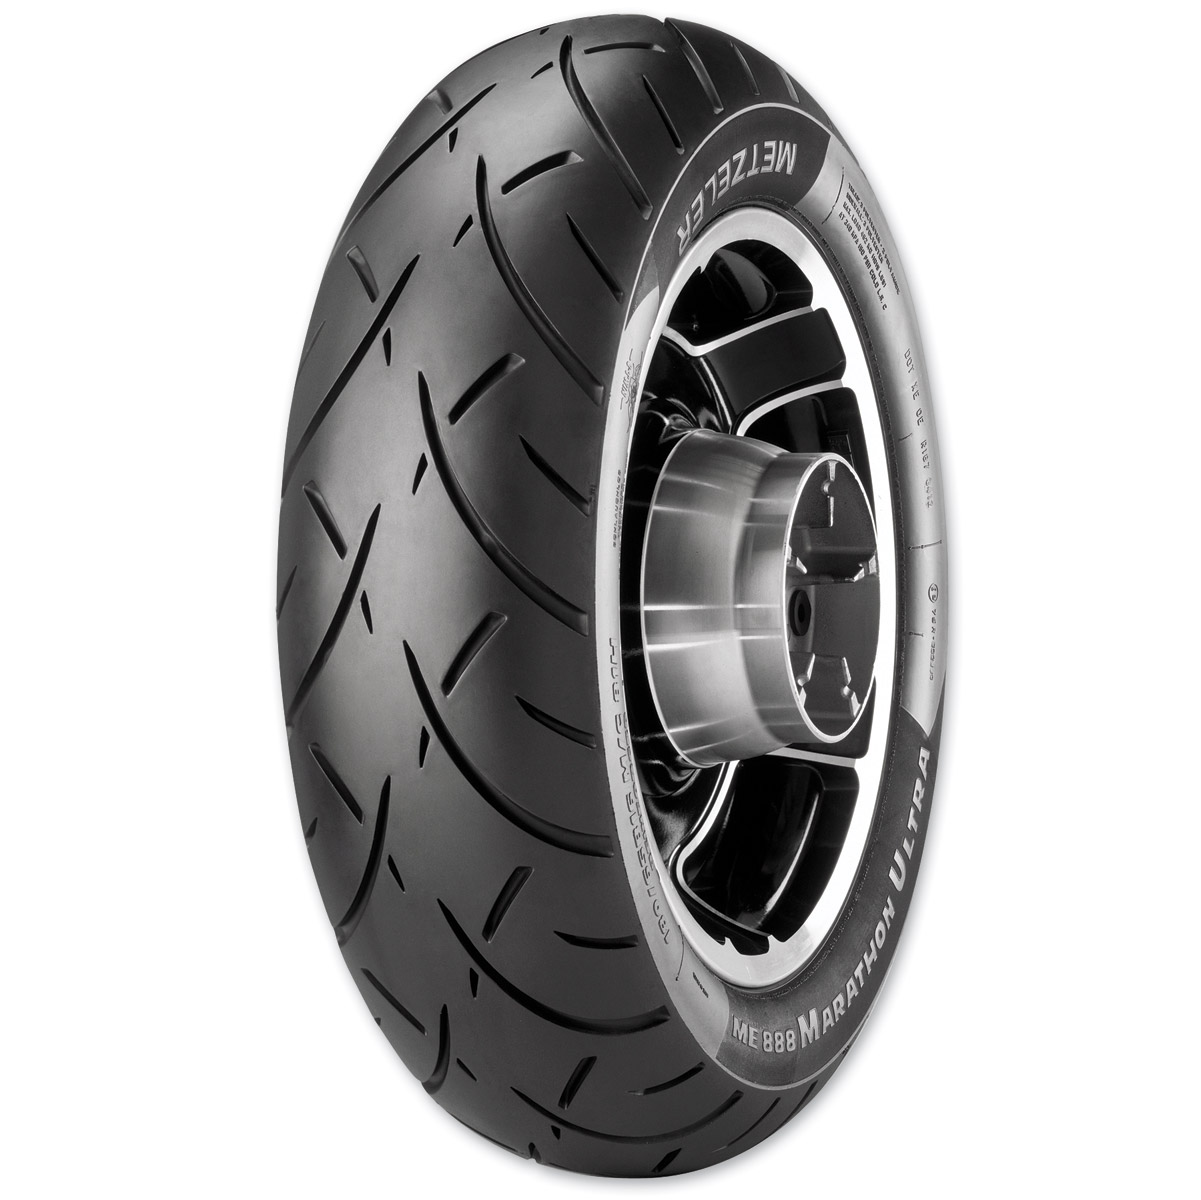 Motorcycle Rear Tire >> Metzeler Me888 Marathon Ultra 140 90b15 Rear Tire 105 483 J P